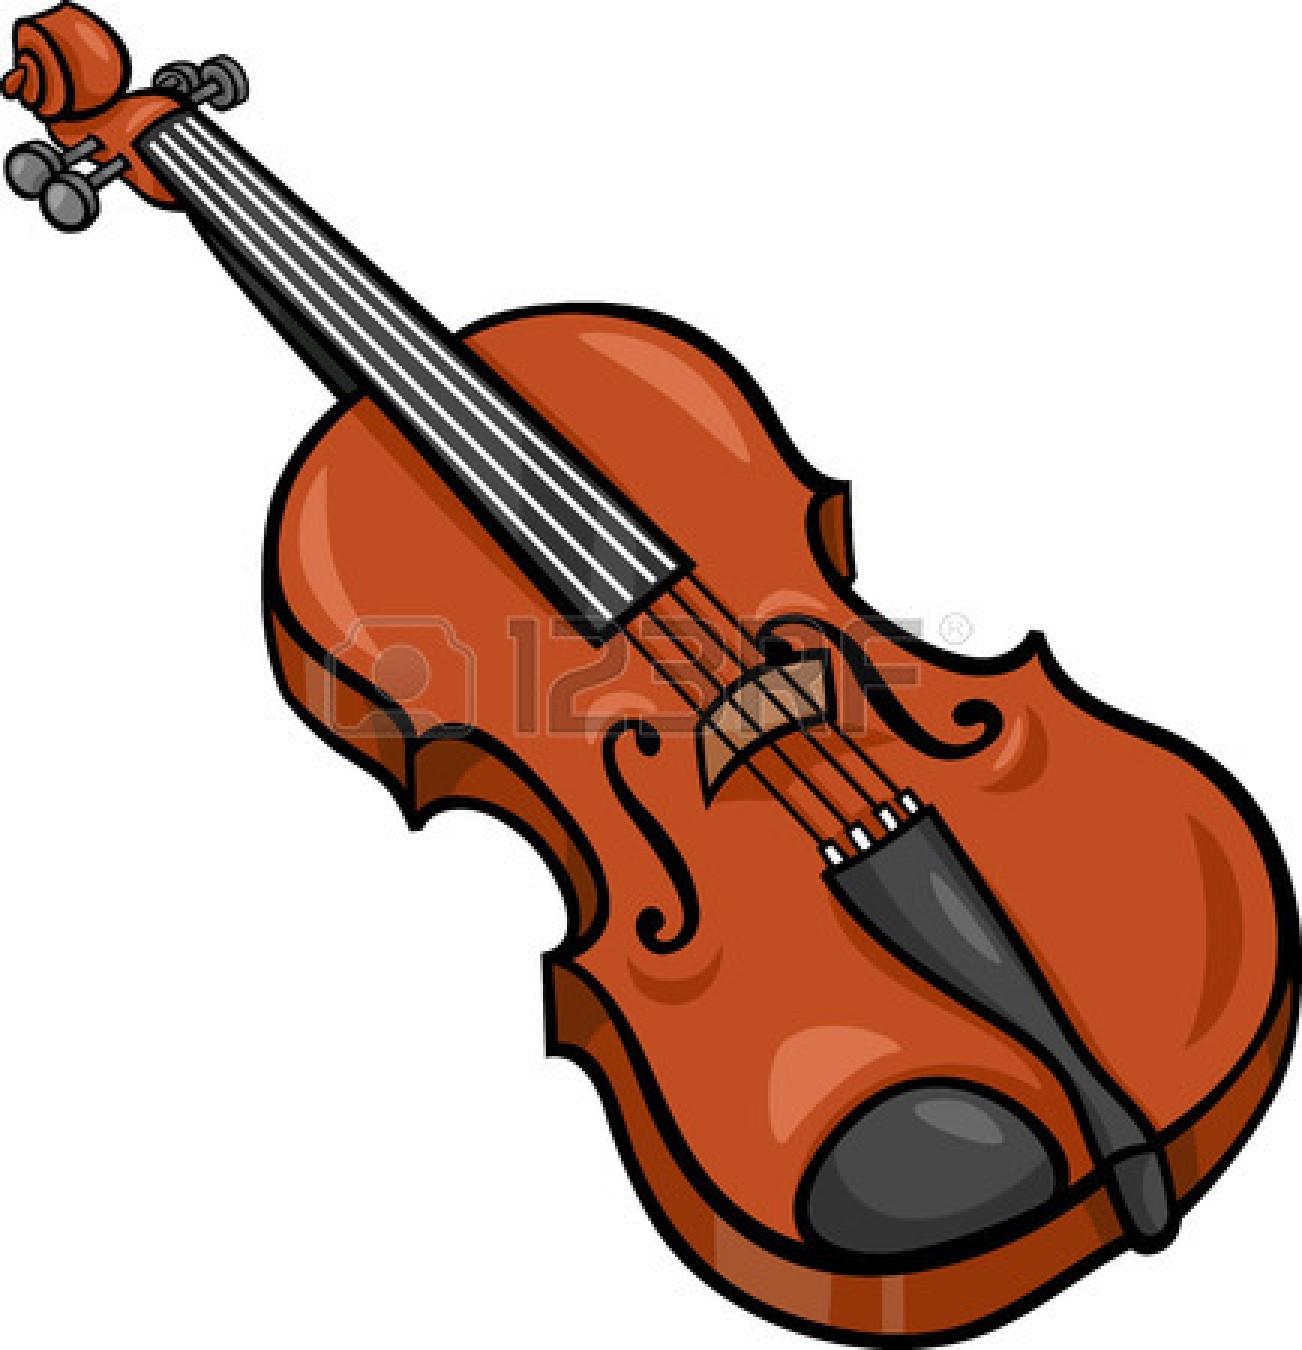 Viola Clipart Violin Clipart-Viola Clipart Violin Clipart-4